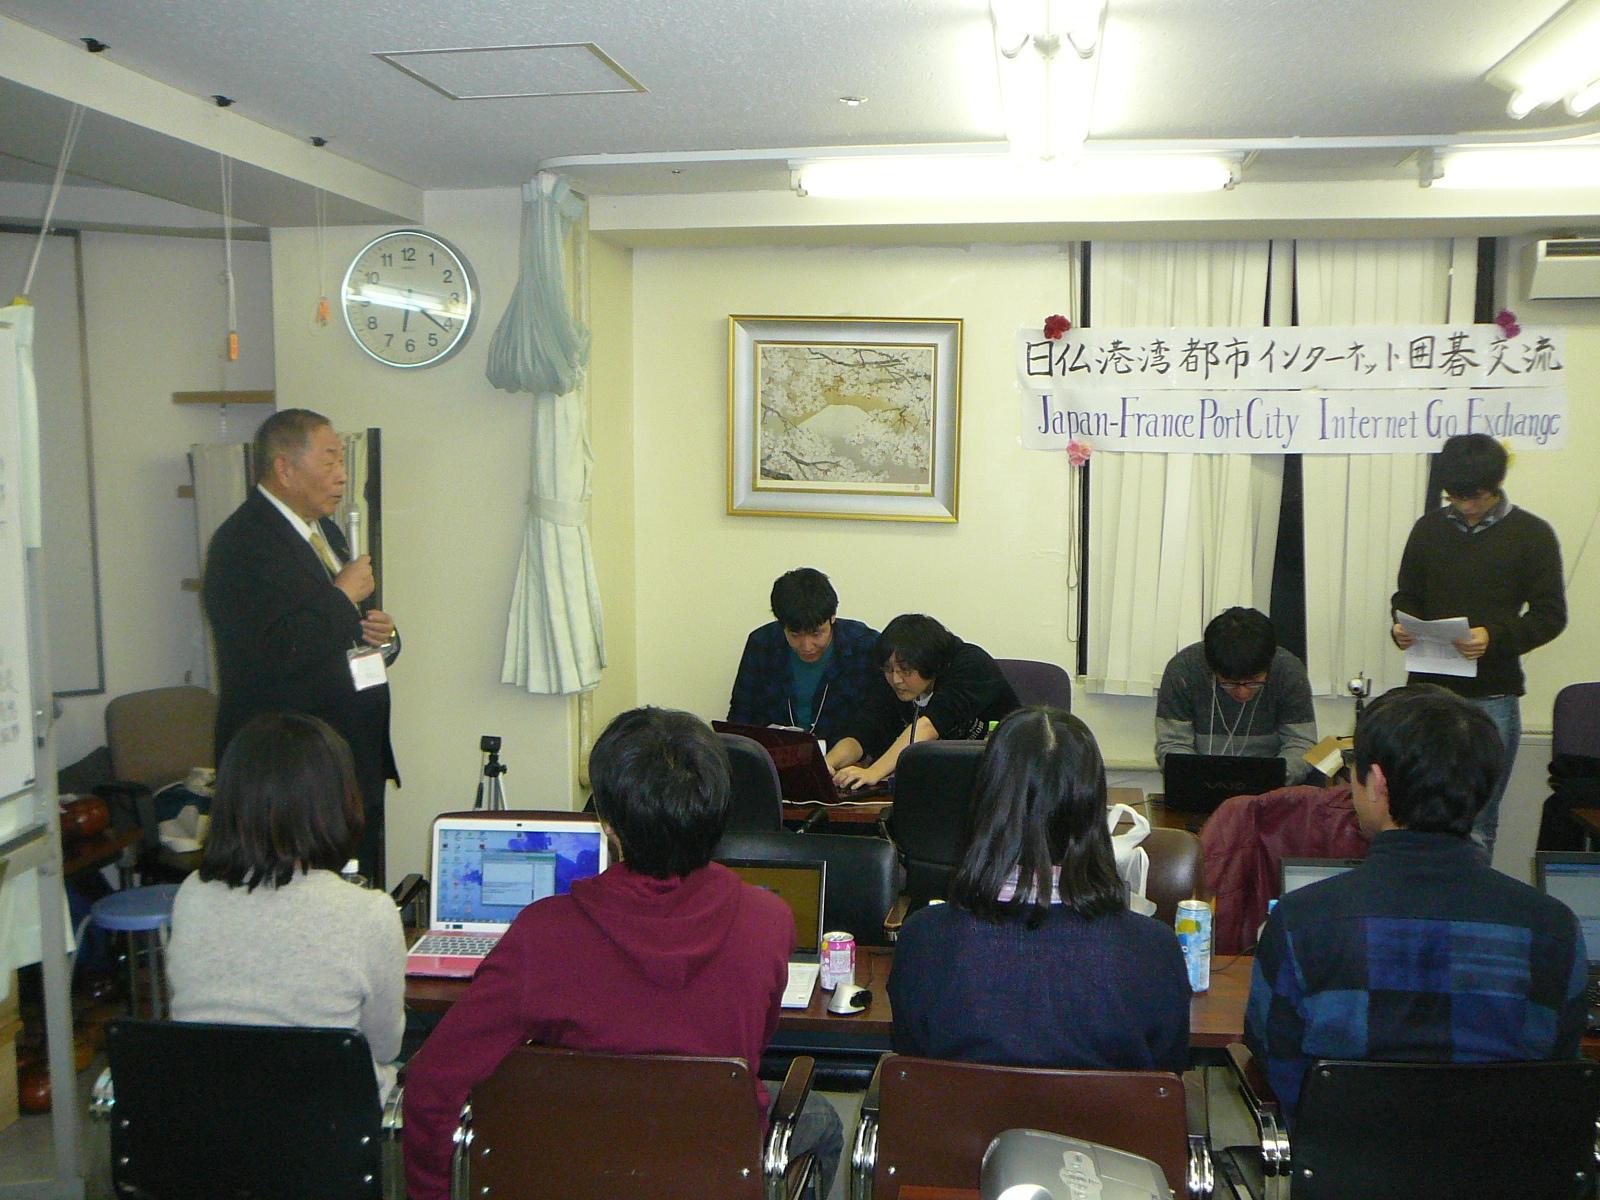 Allocution du leader de Shicho, Hirayama-san